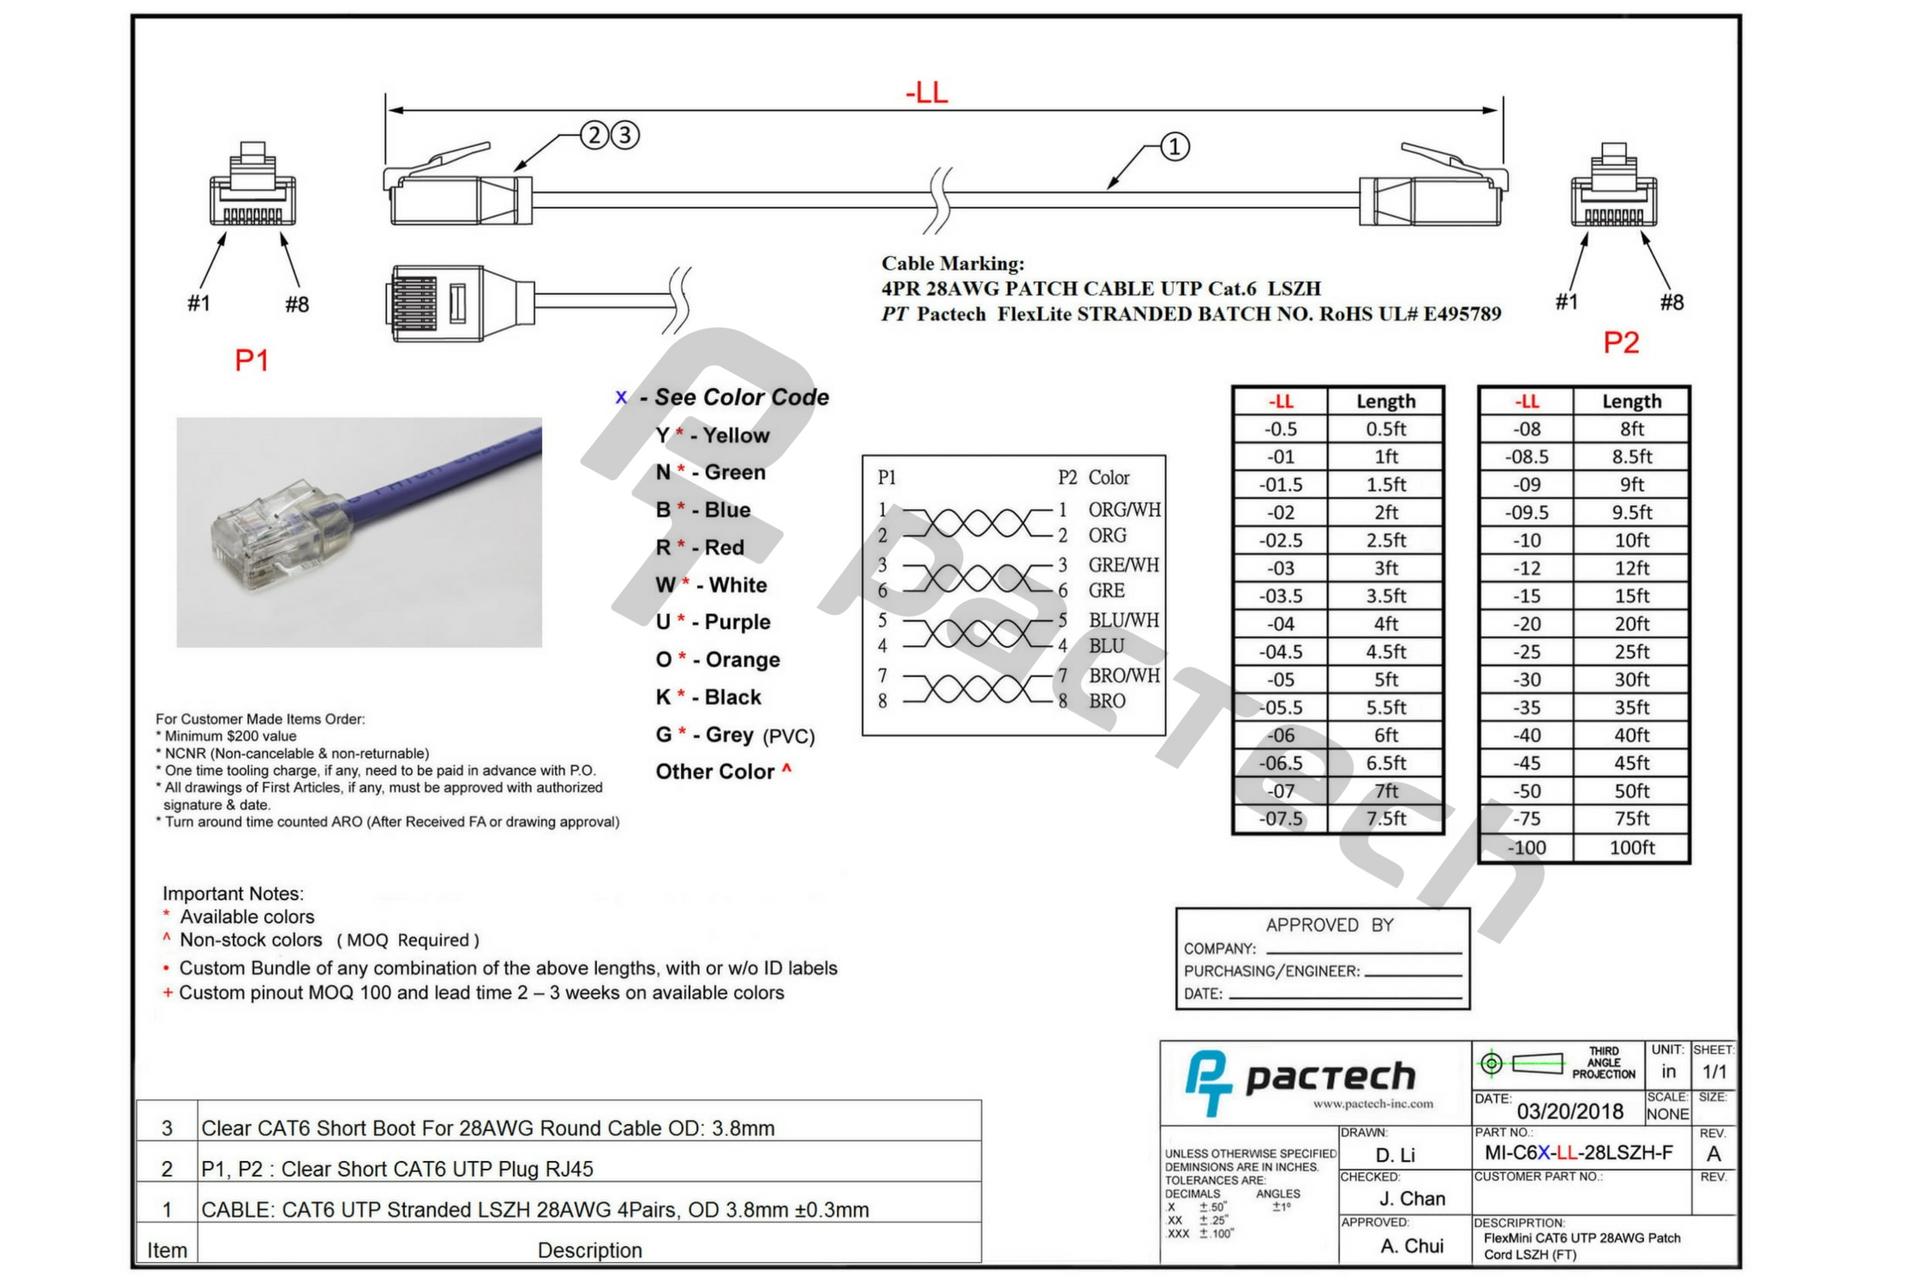 Flexlite Cat6 28AWG Cable UTP LSZH Black 4ft